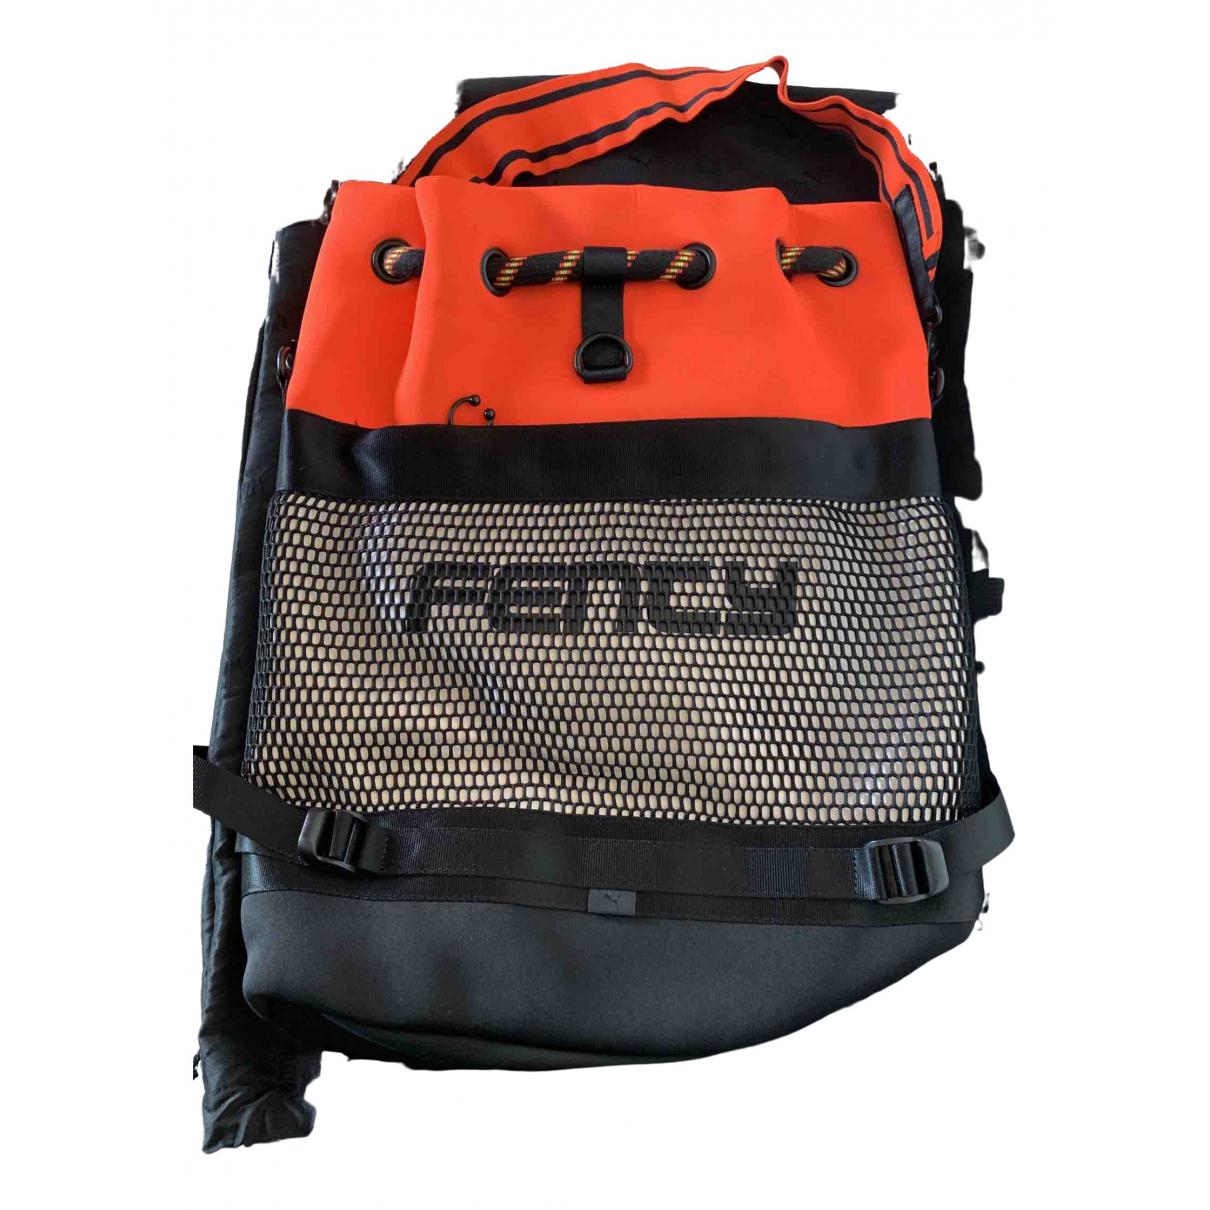 Mochila Fenty X Puma